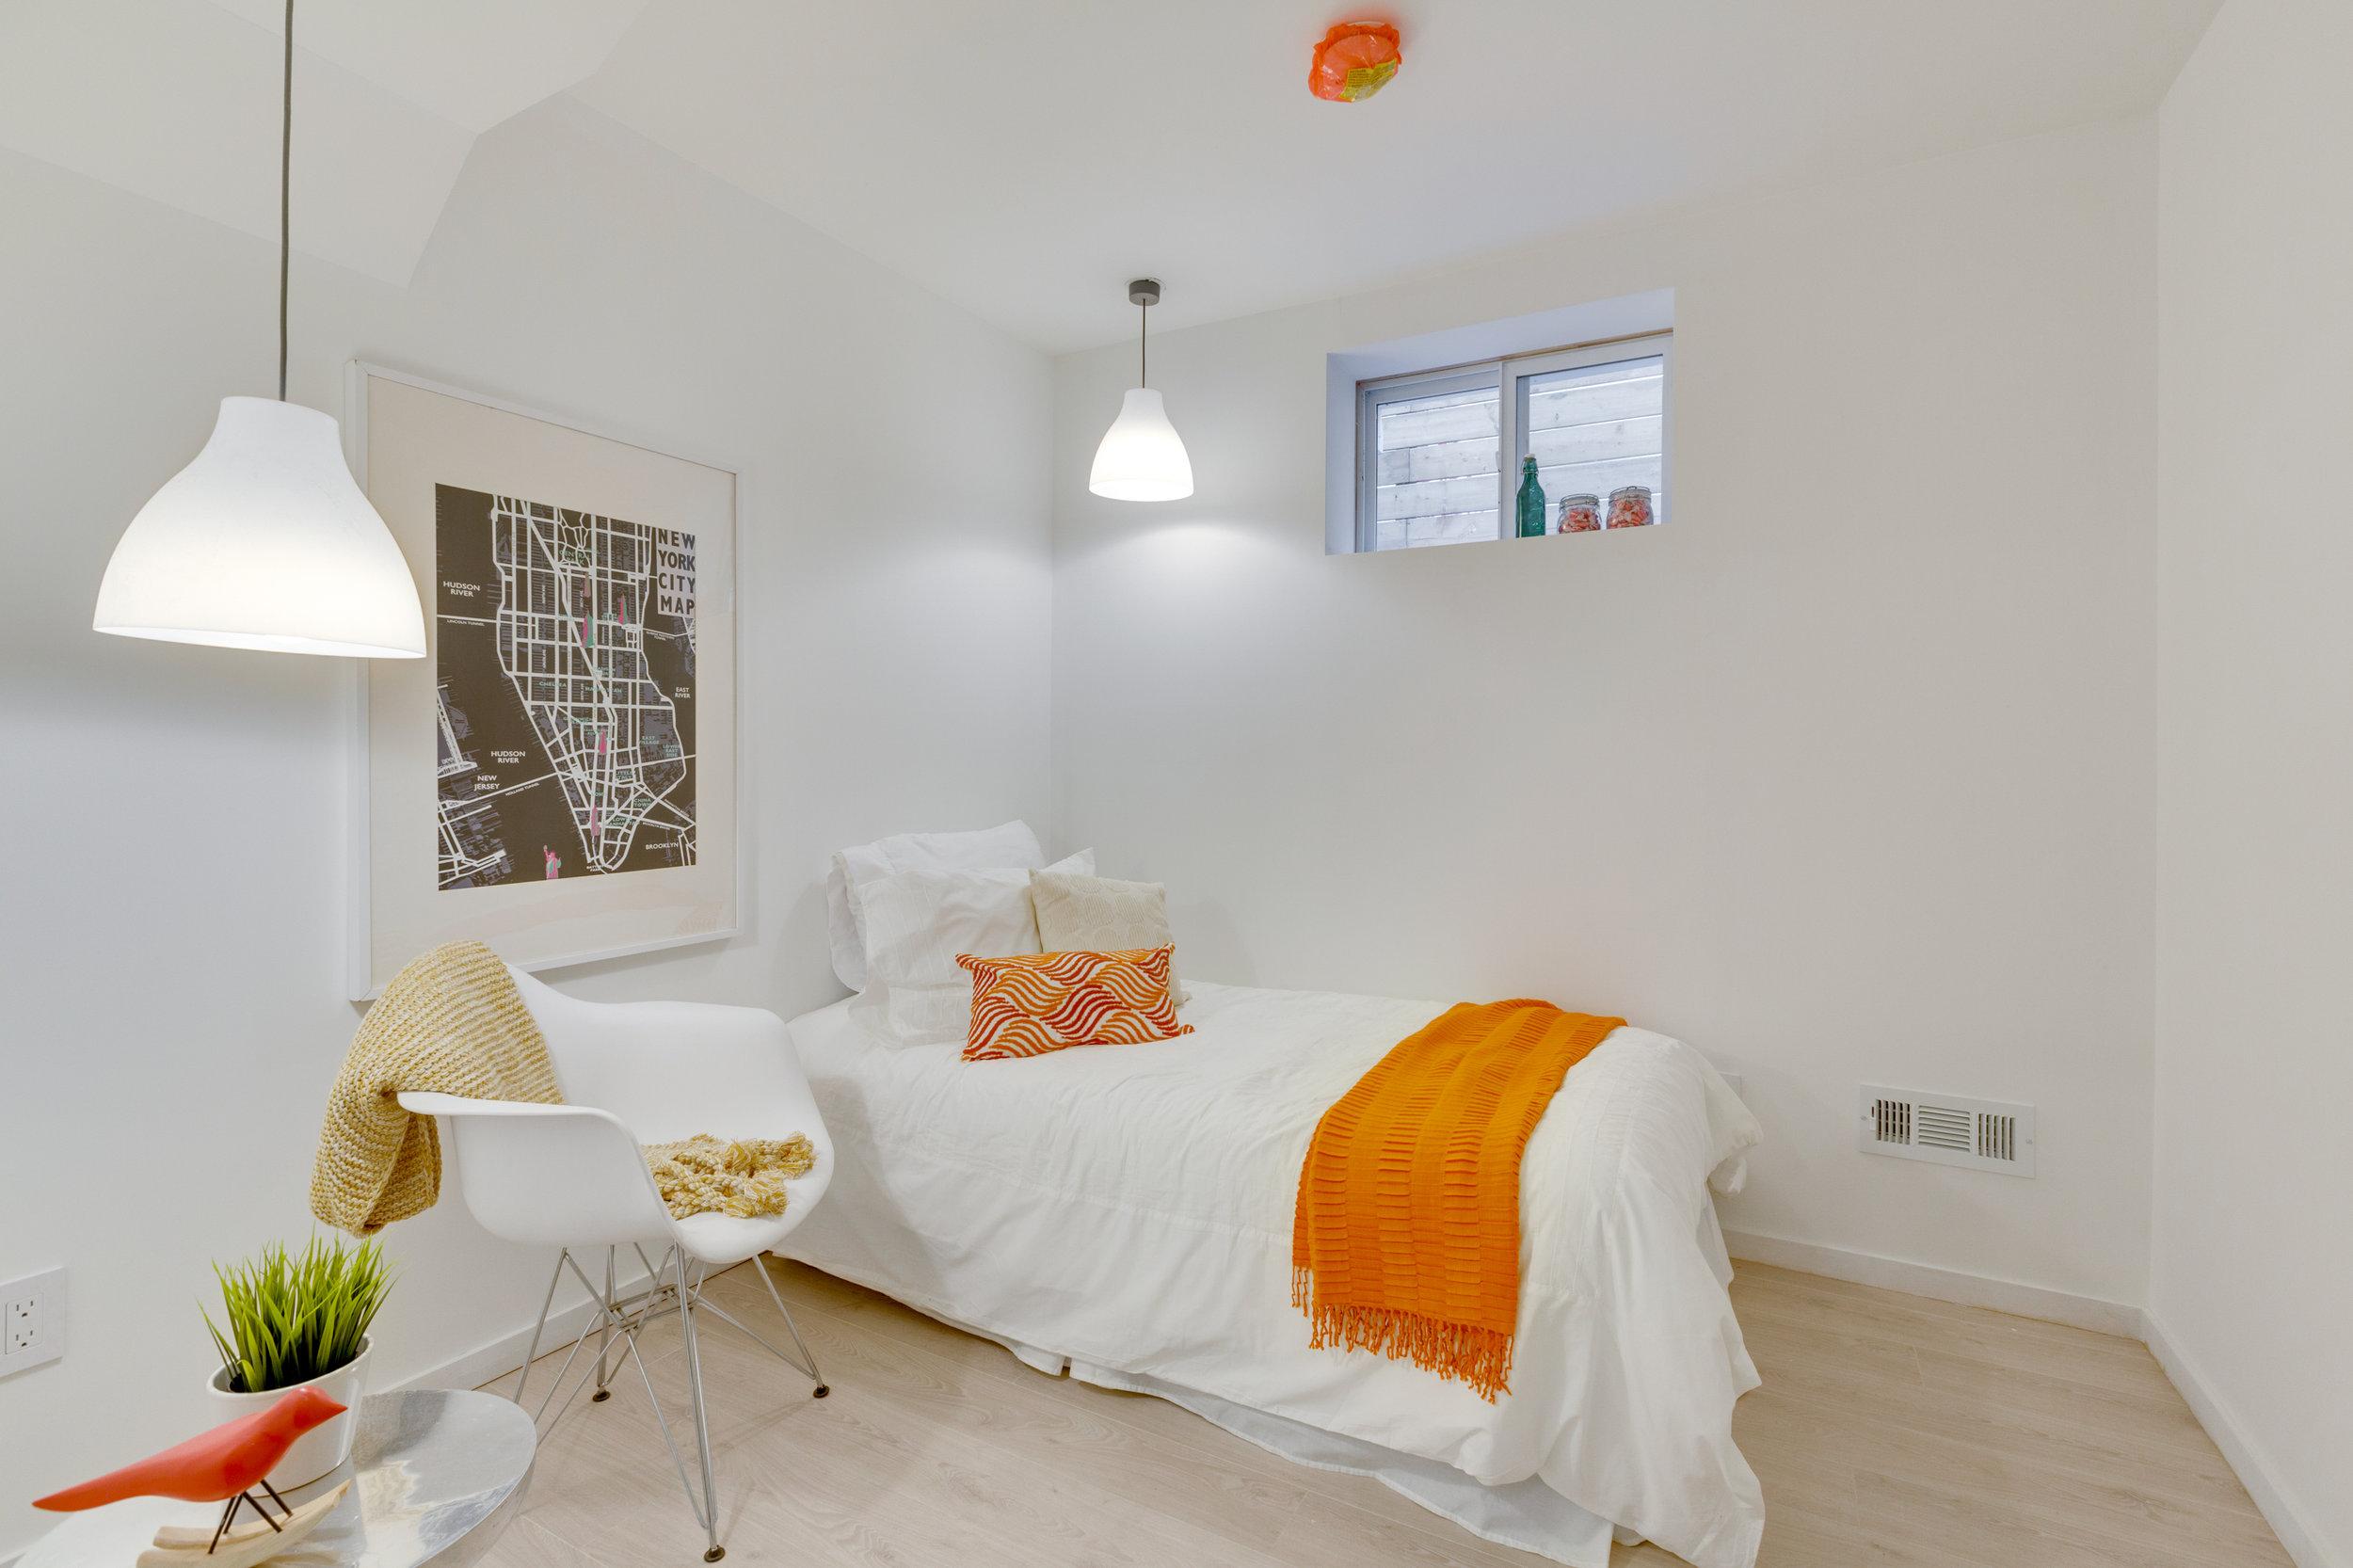 Bedroom - Toronto Home Staging